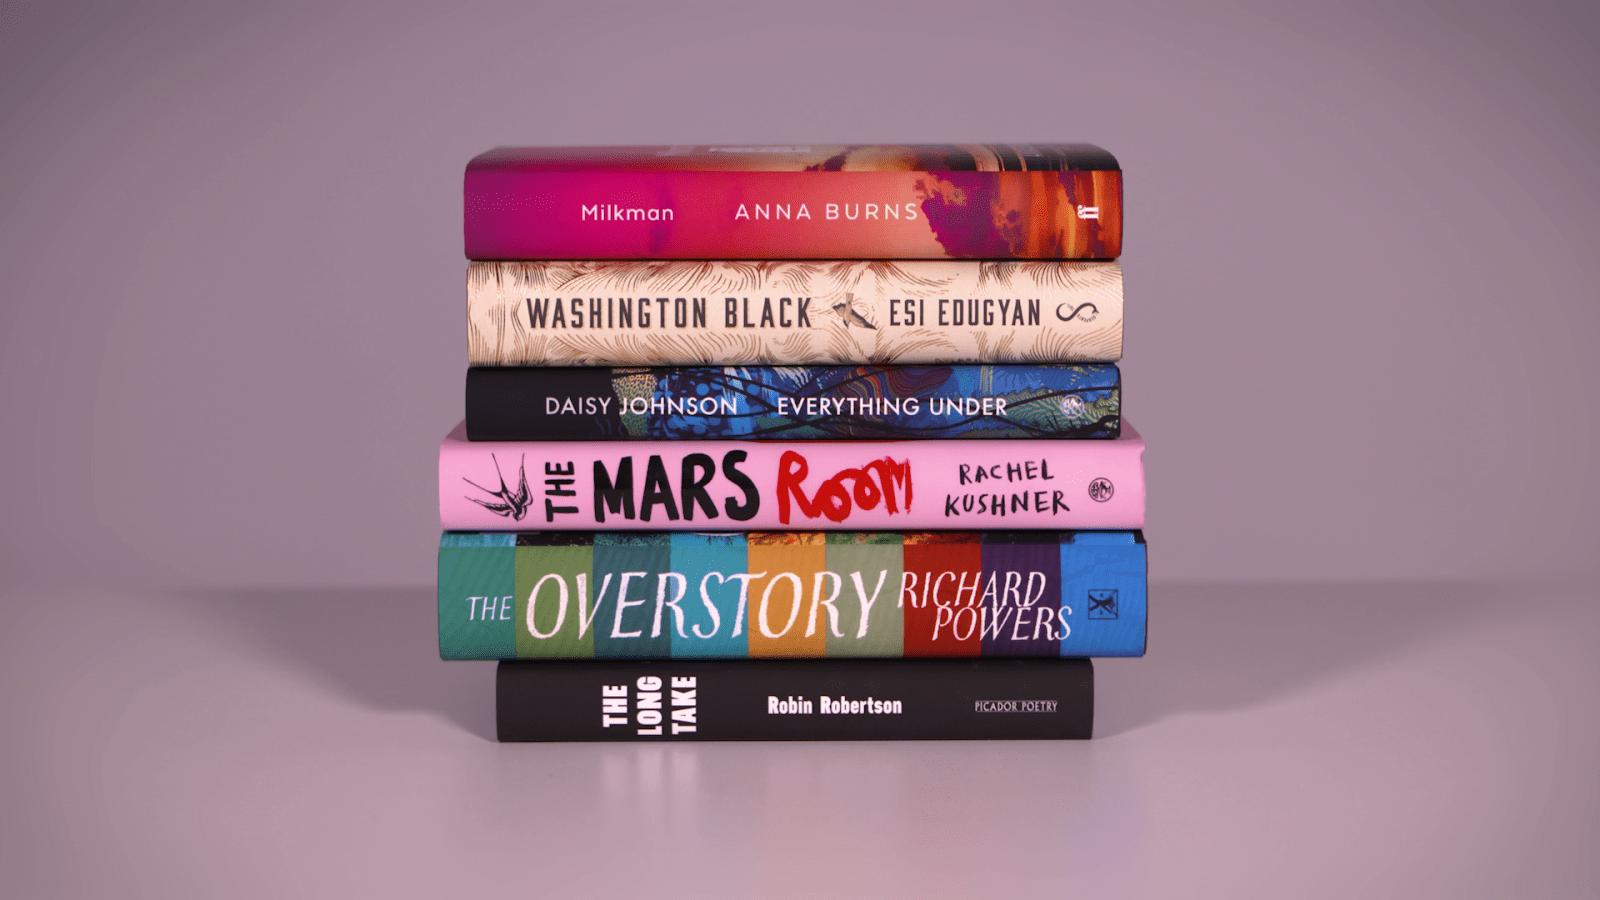 Man Booker Prize shortlist announced